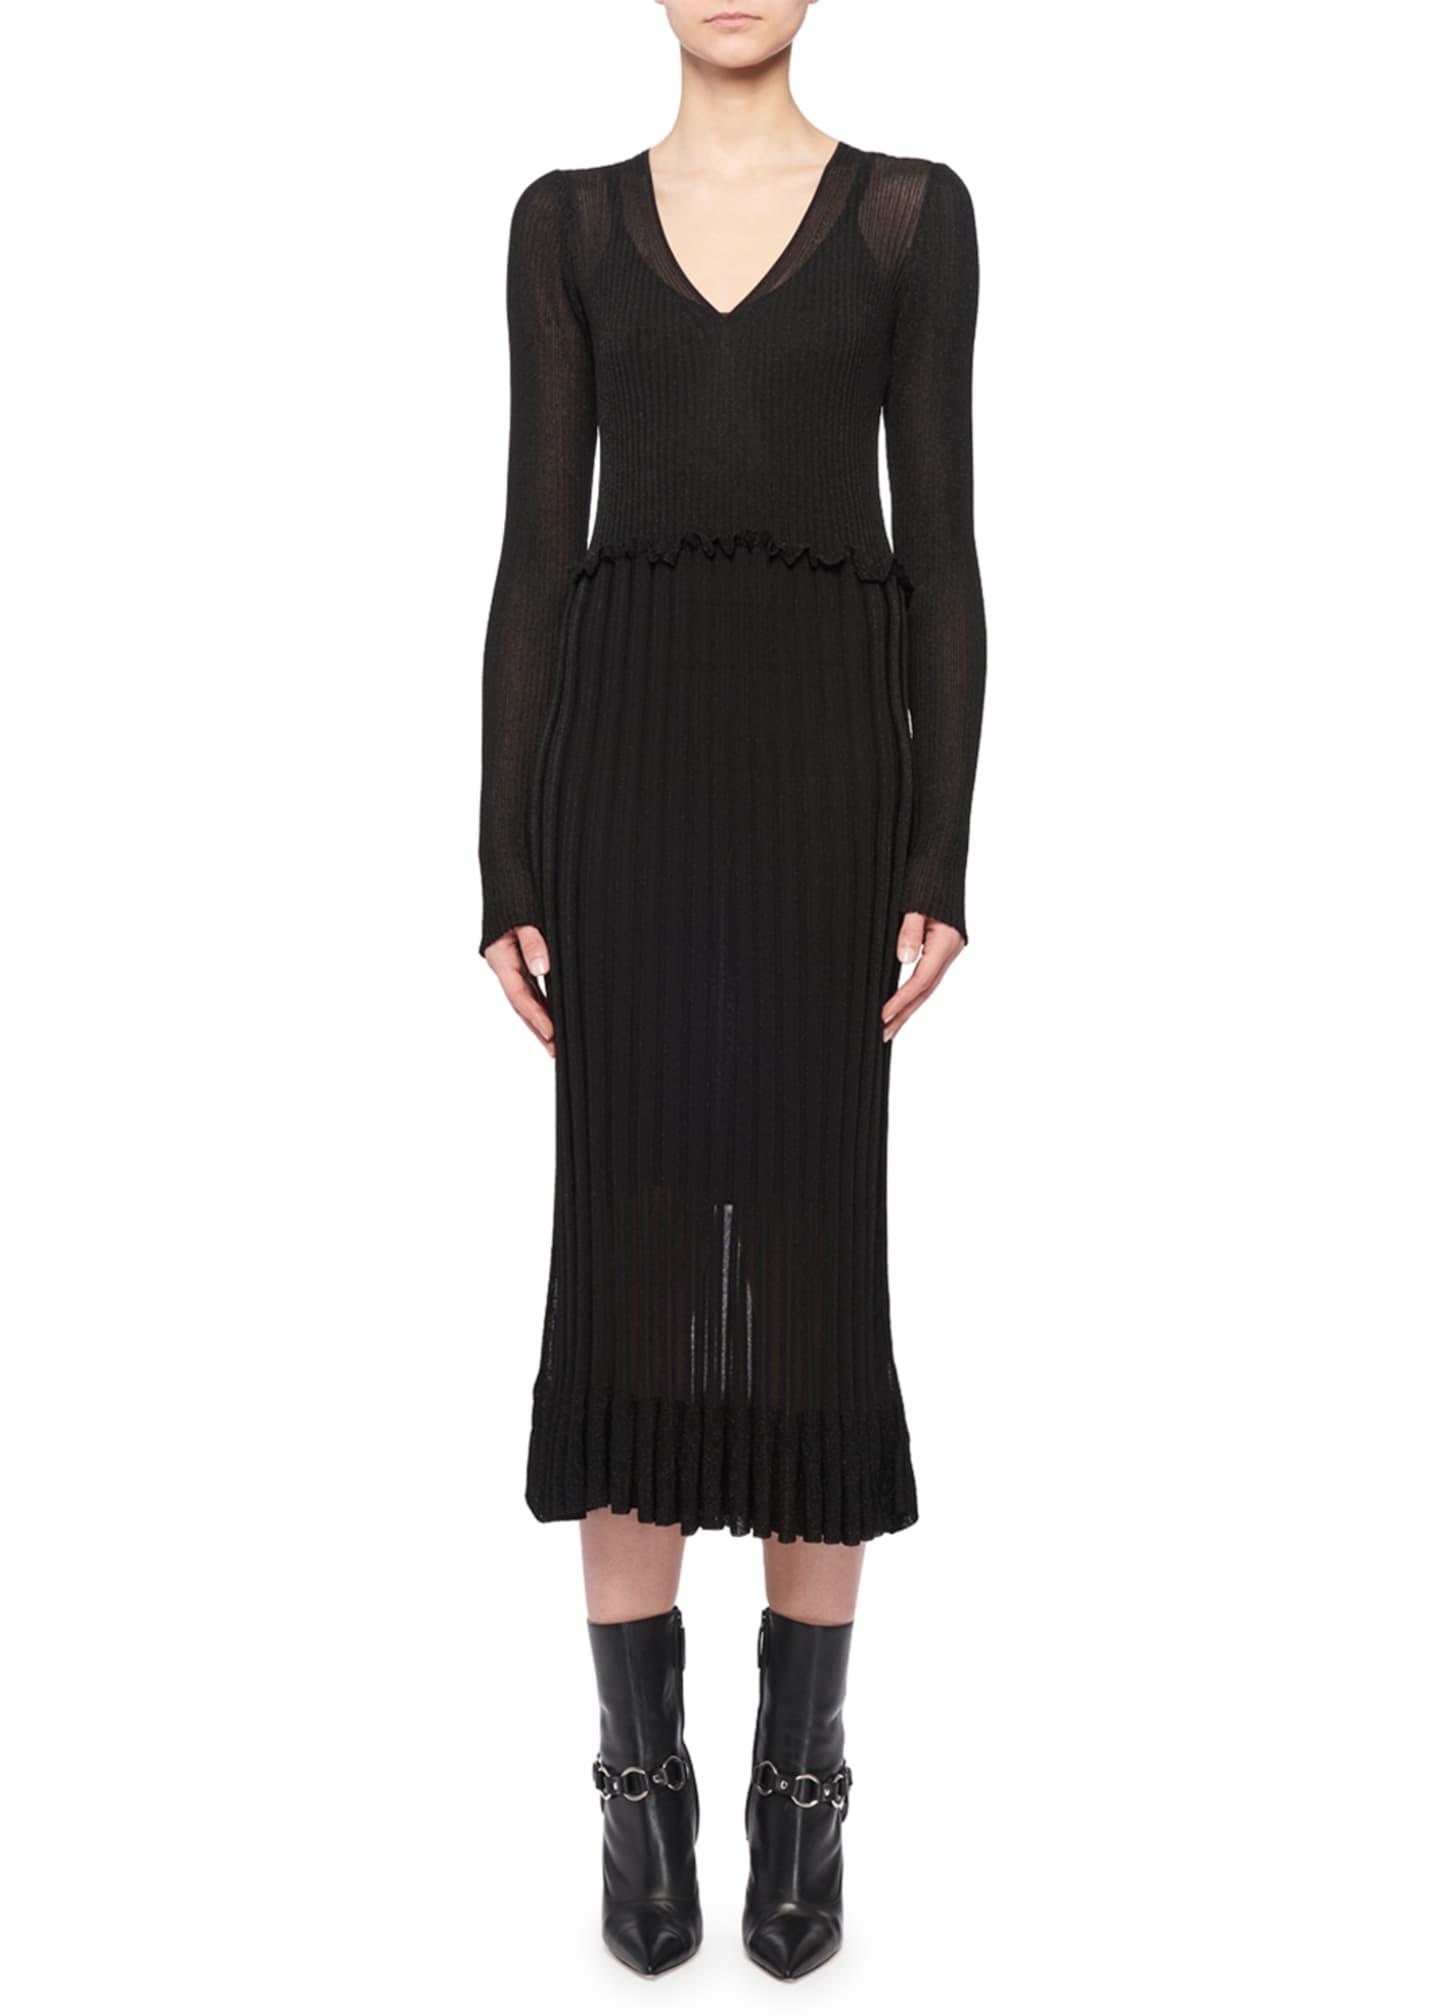 Altuzarra Lurex® Long-Sleeve Dress w/ Flounce Hem